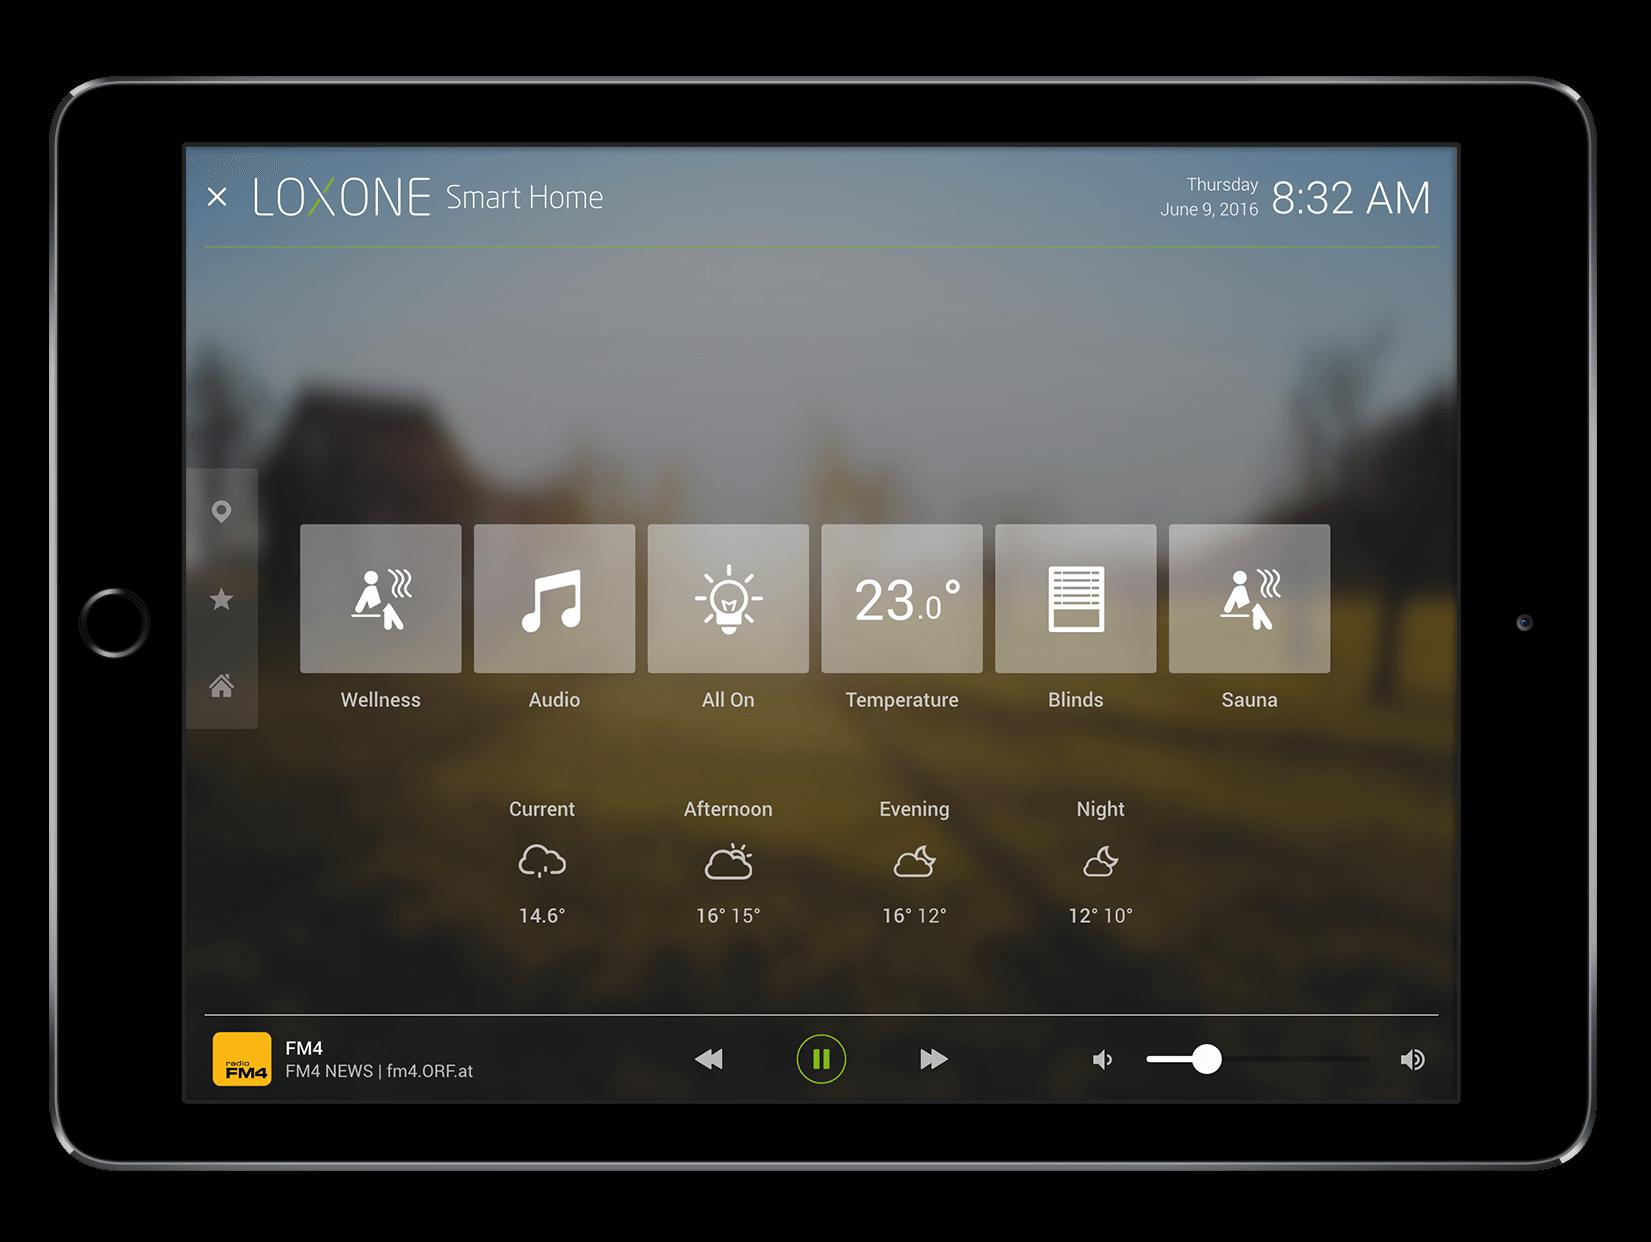 Raummodus in der Loxone App